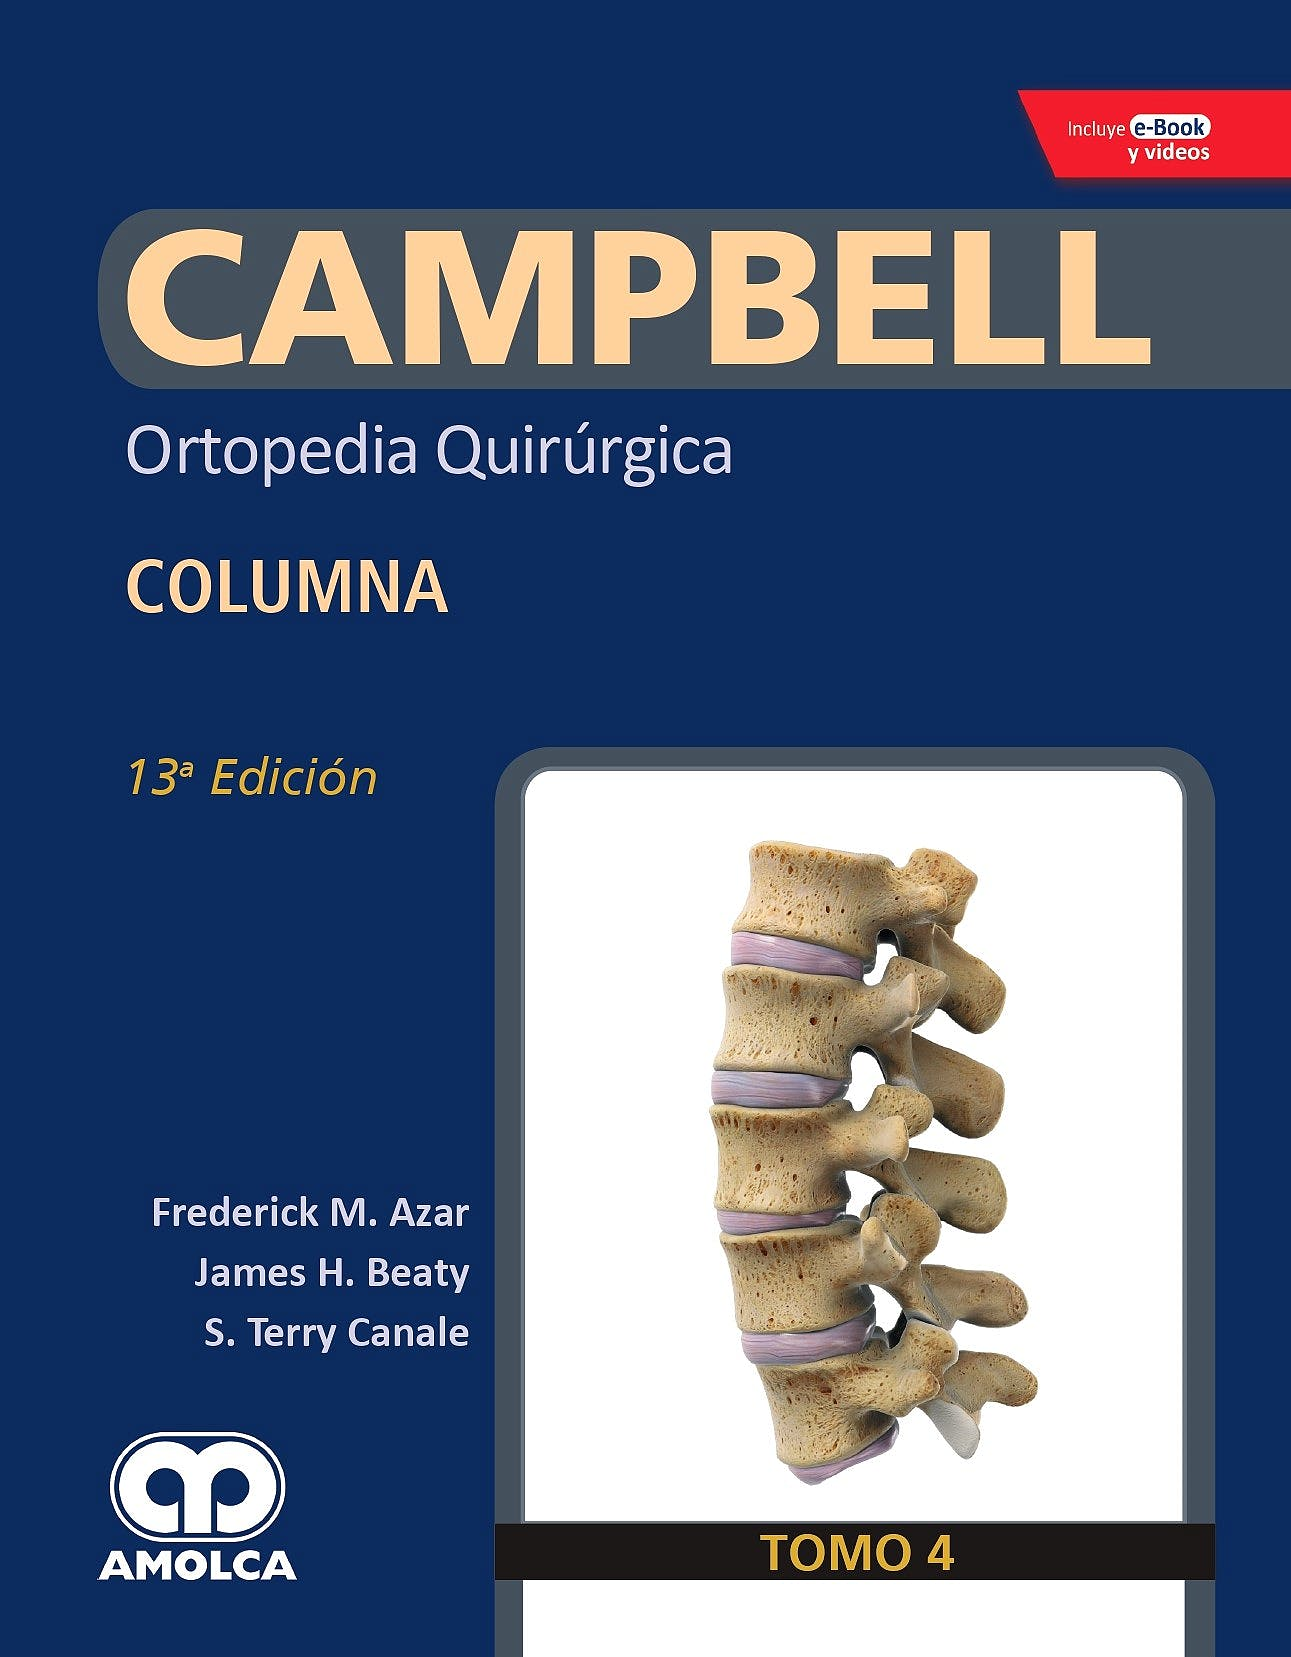 Portada del libro 9789804300943 CAMPBELL Ortopedia Quirúrgica, Tomo 4: Columna + E-Book y Videos